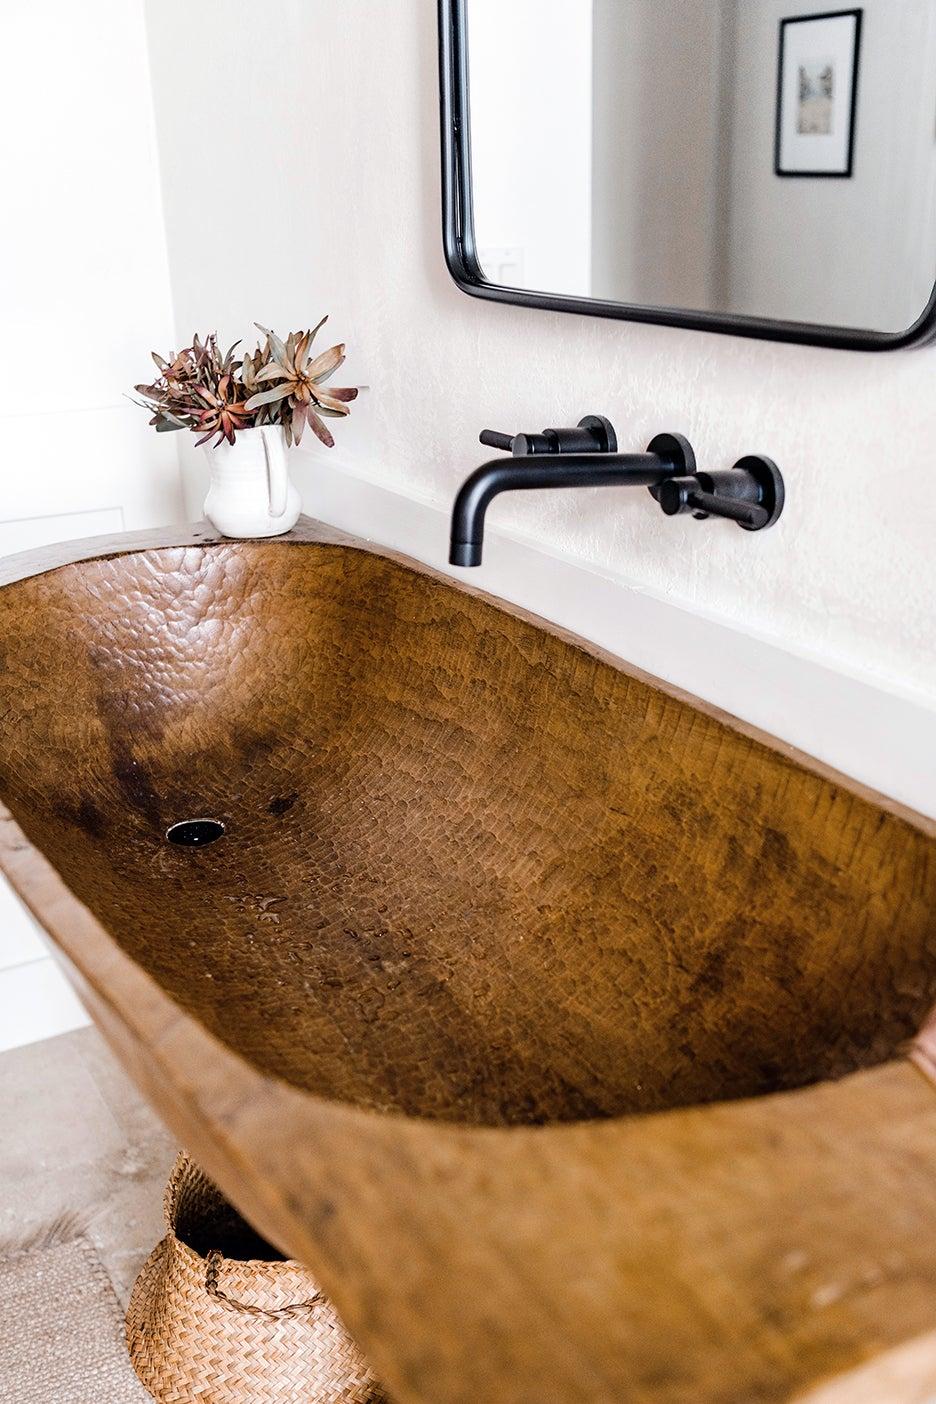 trough of bowl sink